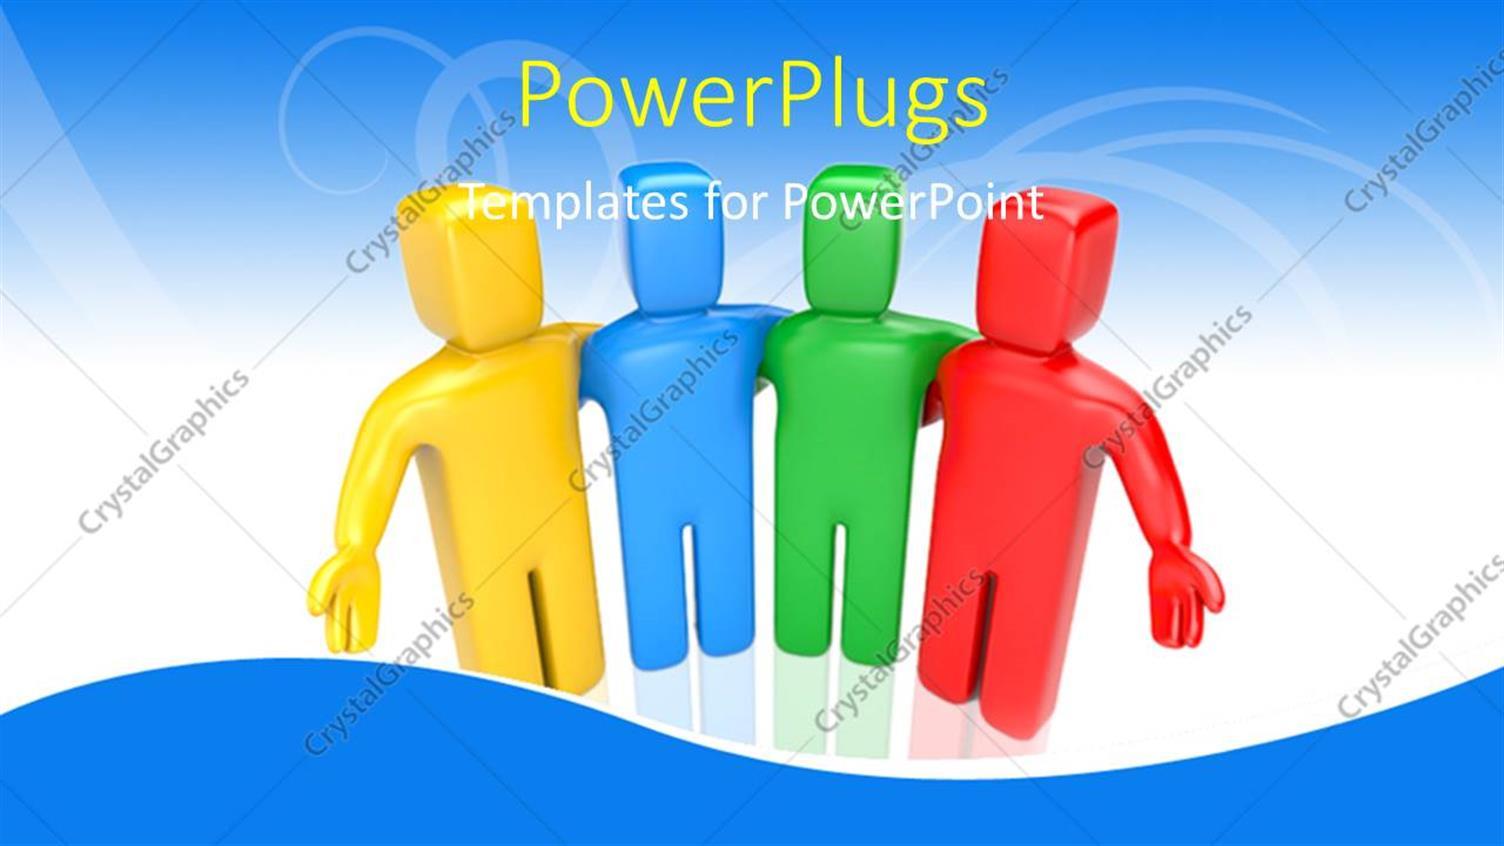 Powerpoint template colorful 3d men displays teamwork on abstract powerpoint template displaying colorful 3d men displays teamwork on abstract blue background toneelgroepblik Choice Image